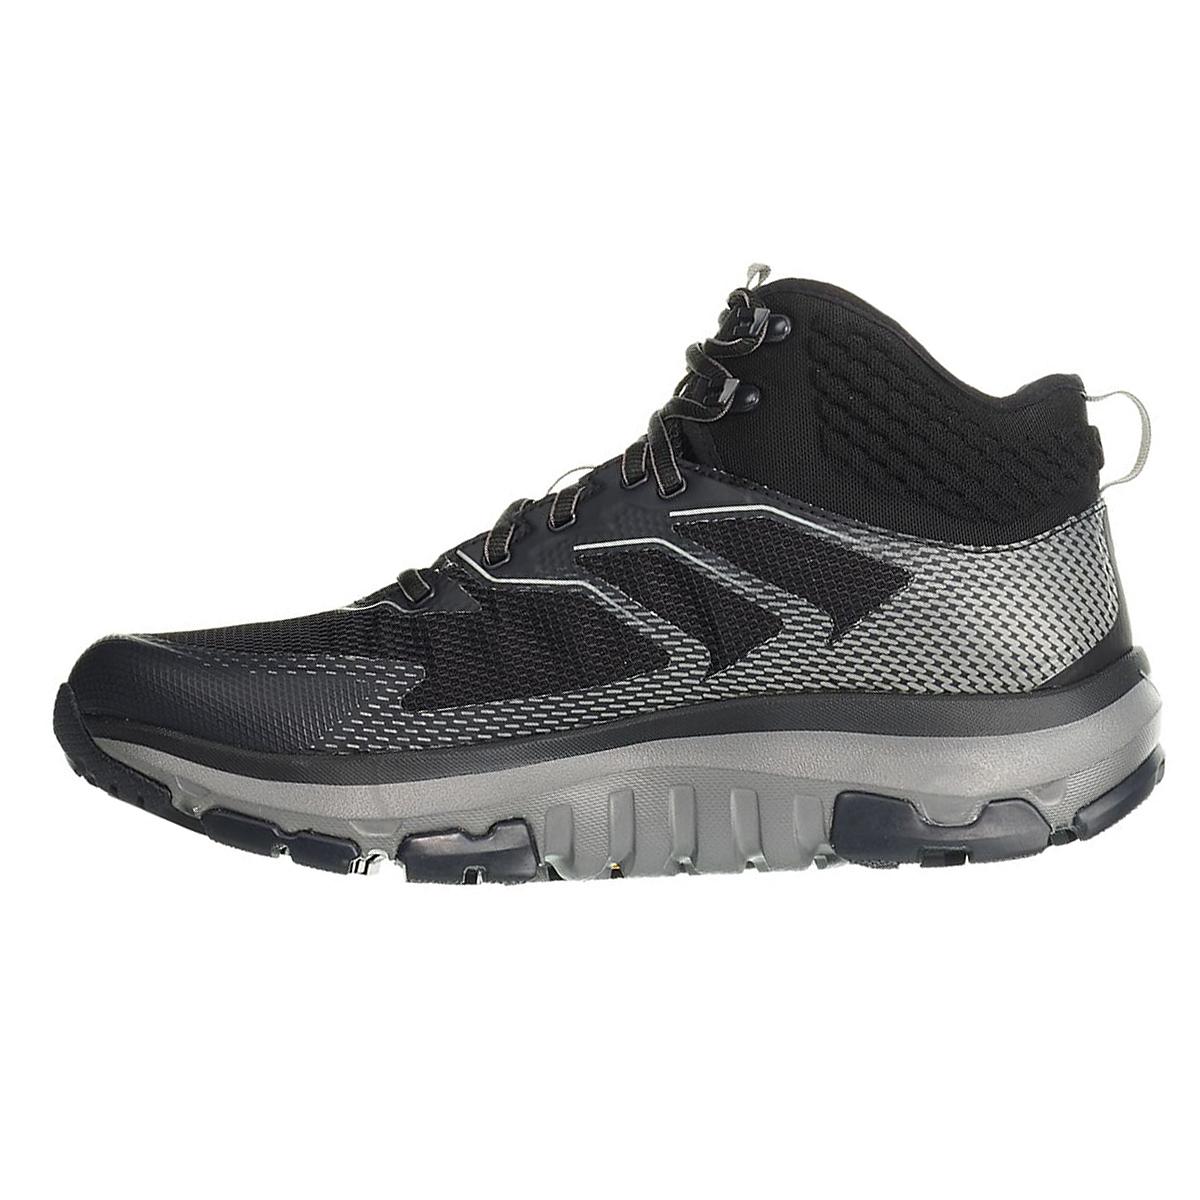 Men's Hoka One One Sky Toa Gore-Tex Trail Running Shoe - Color: Phantom - Size: 7 - Width: Regular, Phantom, large, image 2